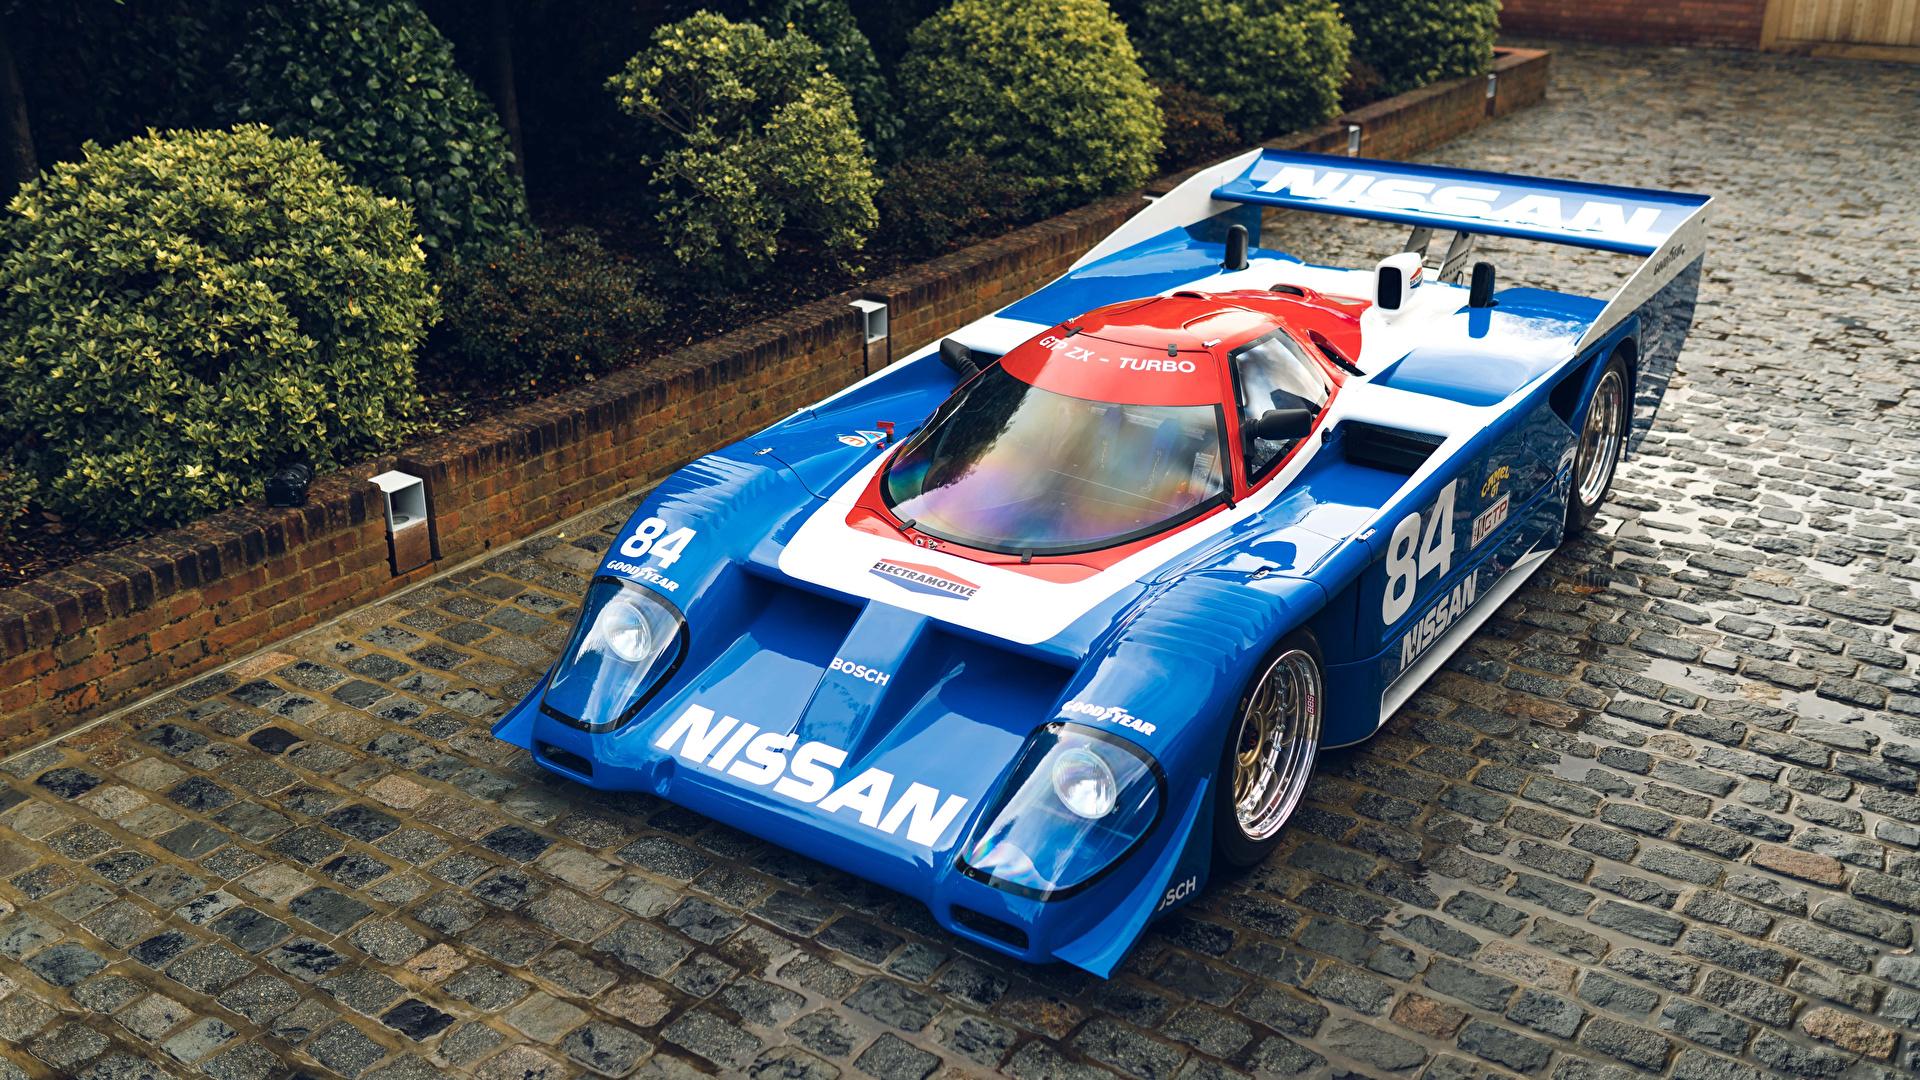 Фото Ниссан Стайлинг 1985-91 GTP ZX-Turbo Винтаж голубая Металлик Автомобили 1920x1080 Nissan Тюнинг Ретро голубых голубые Голубой старинные авто машина машины автомобиль